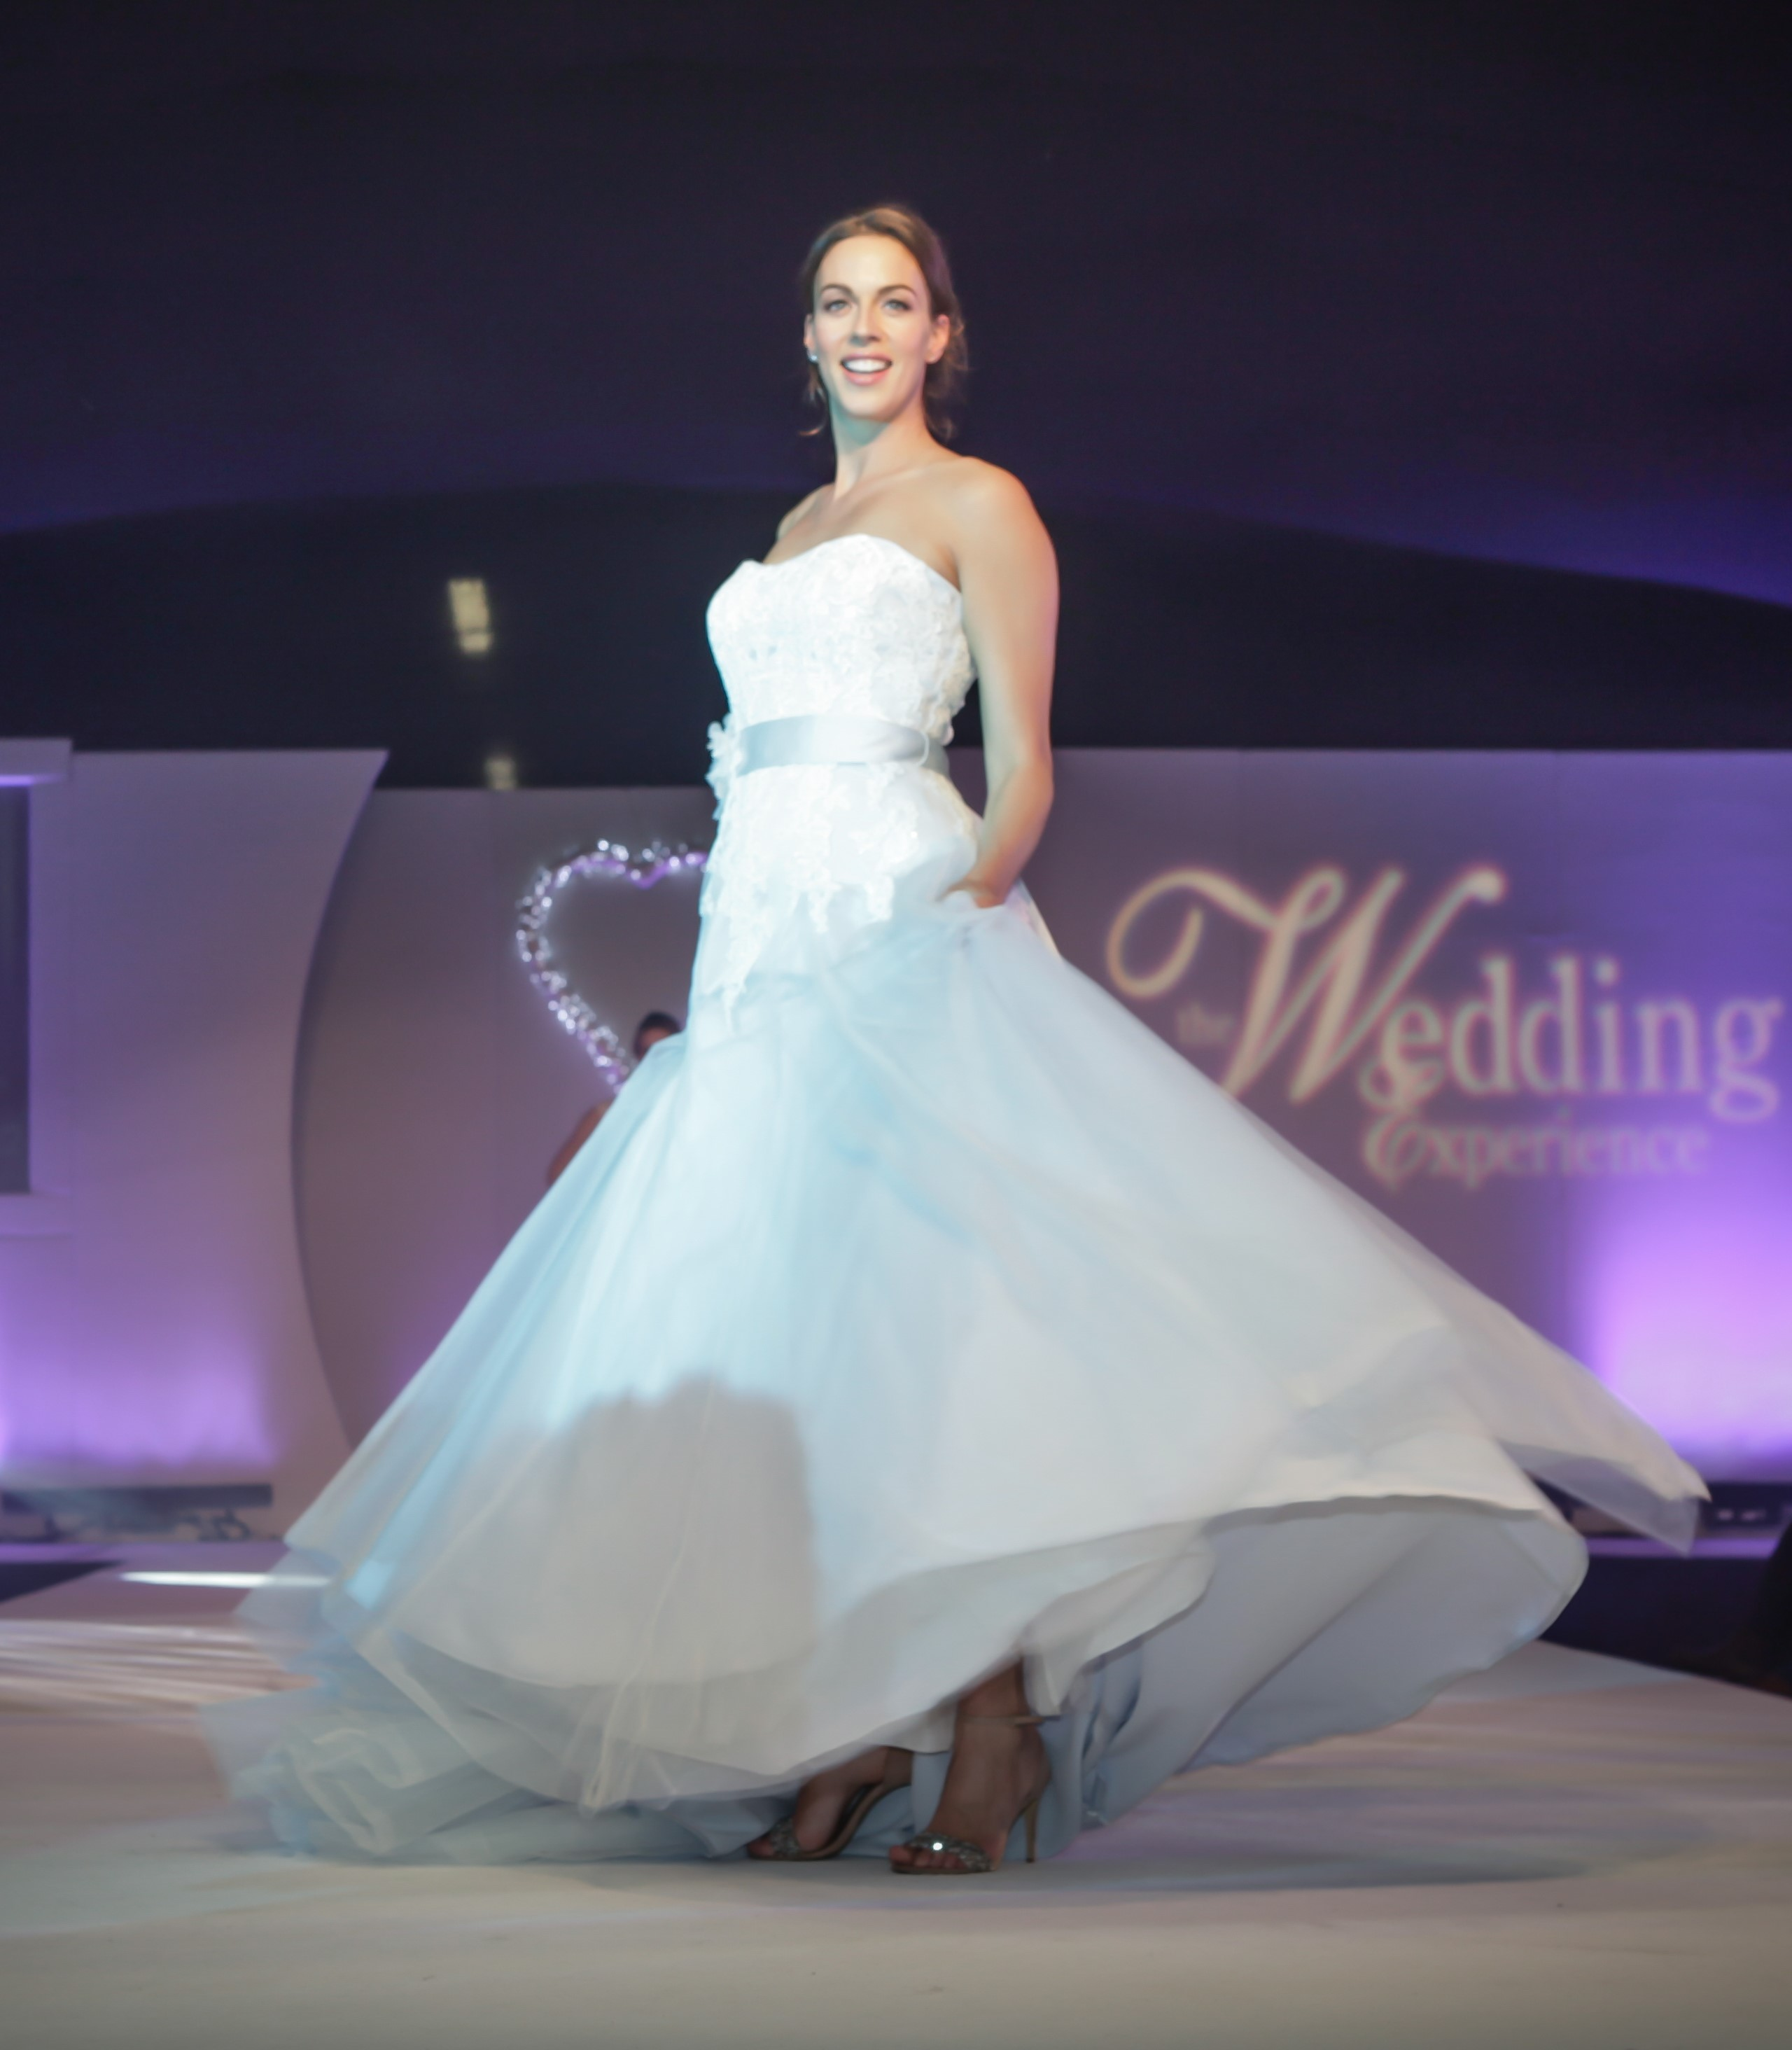 Shine-Female-London-Model-Siobhan-P-Plus-size-model-17-2.jpg#asset:44388